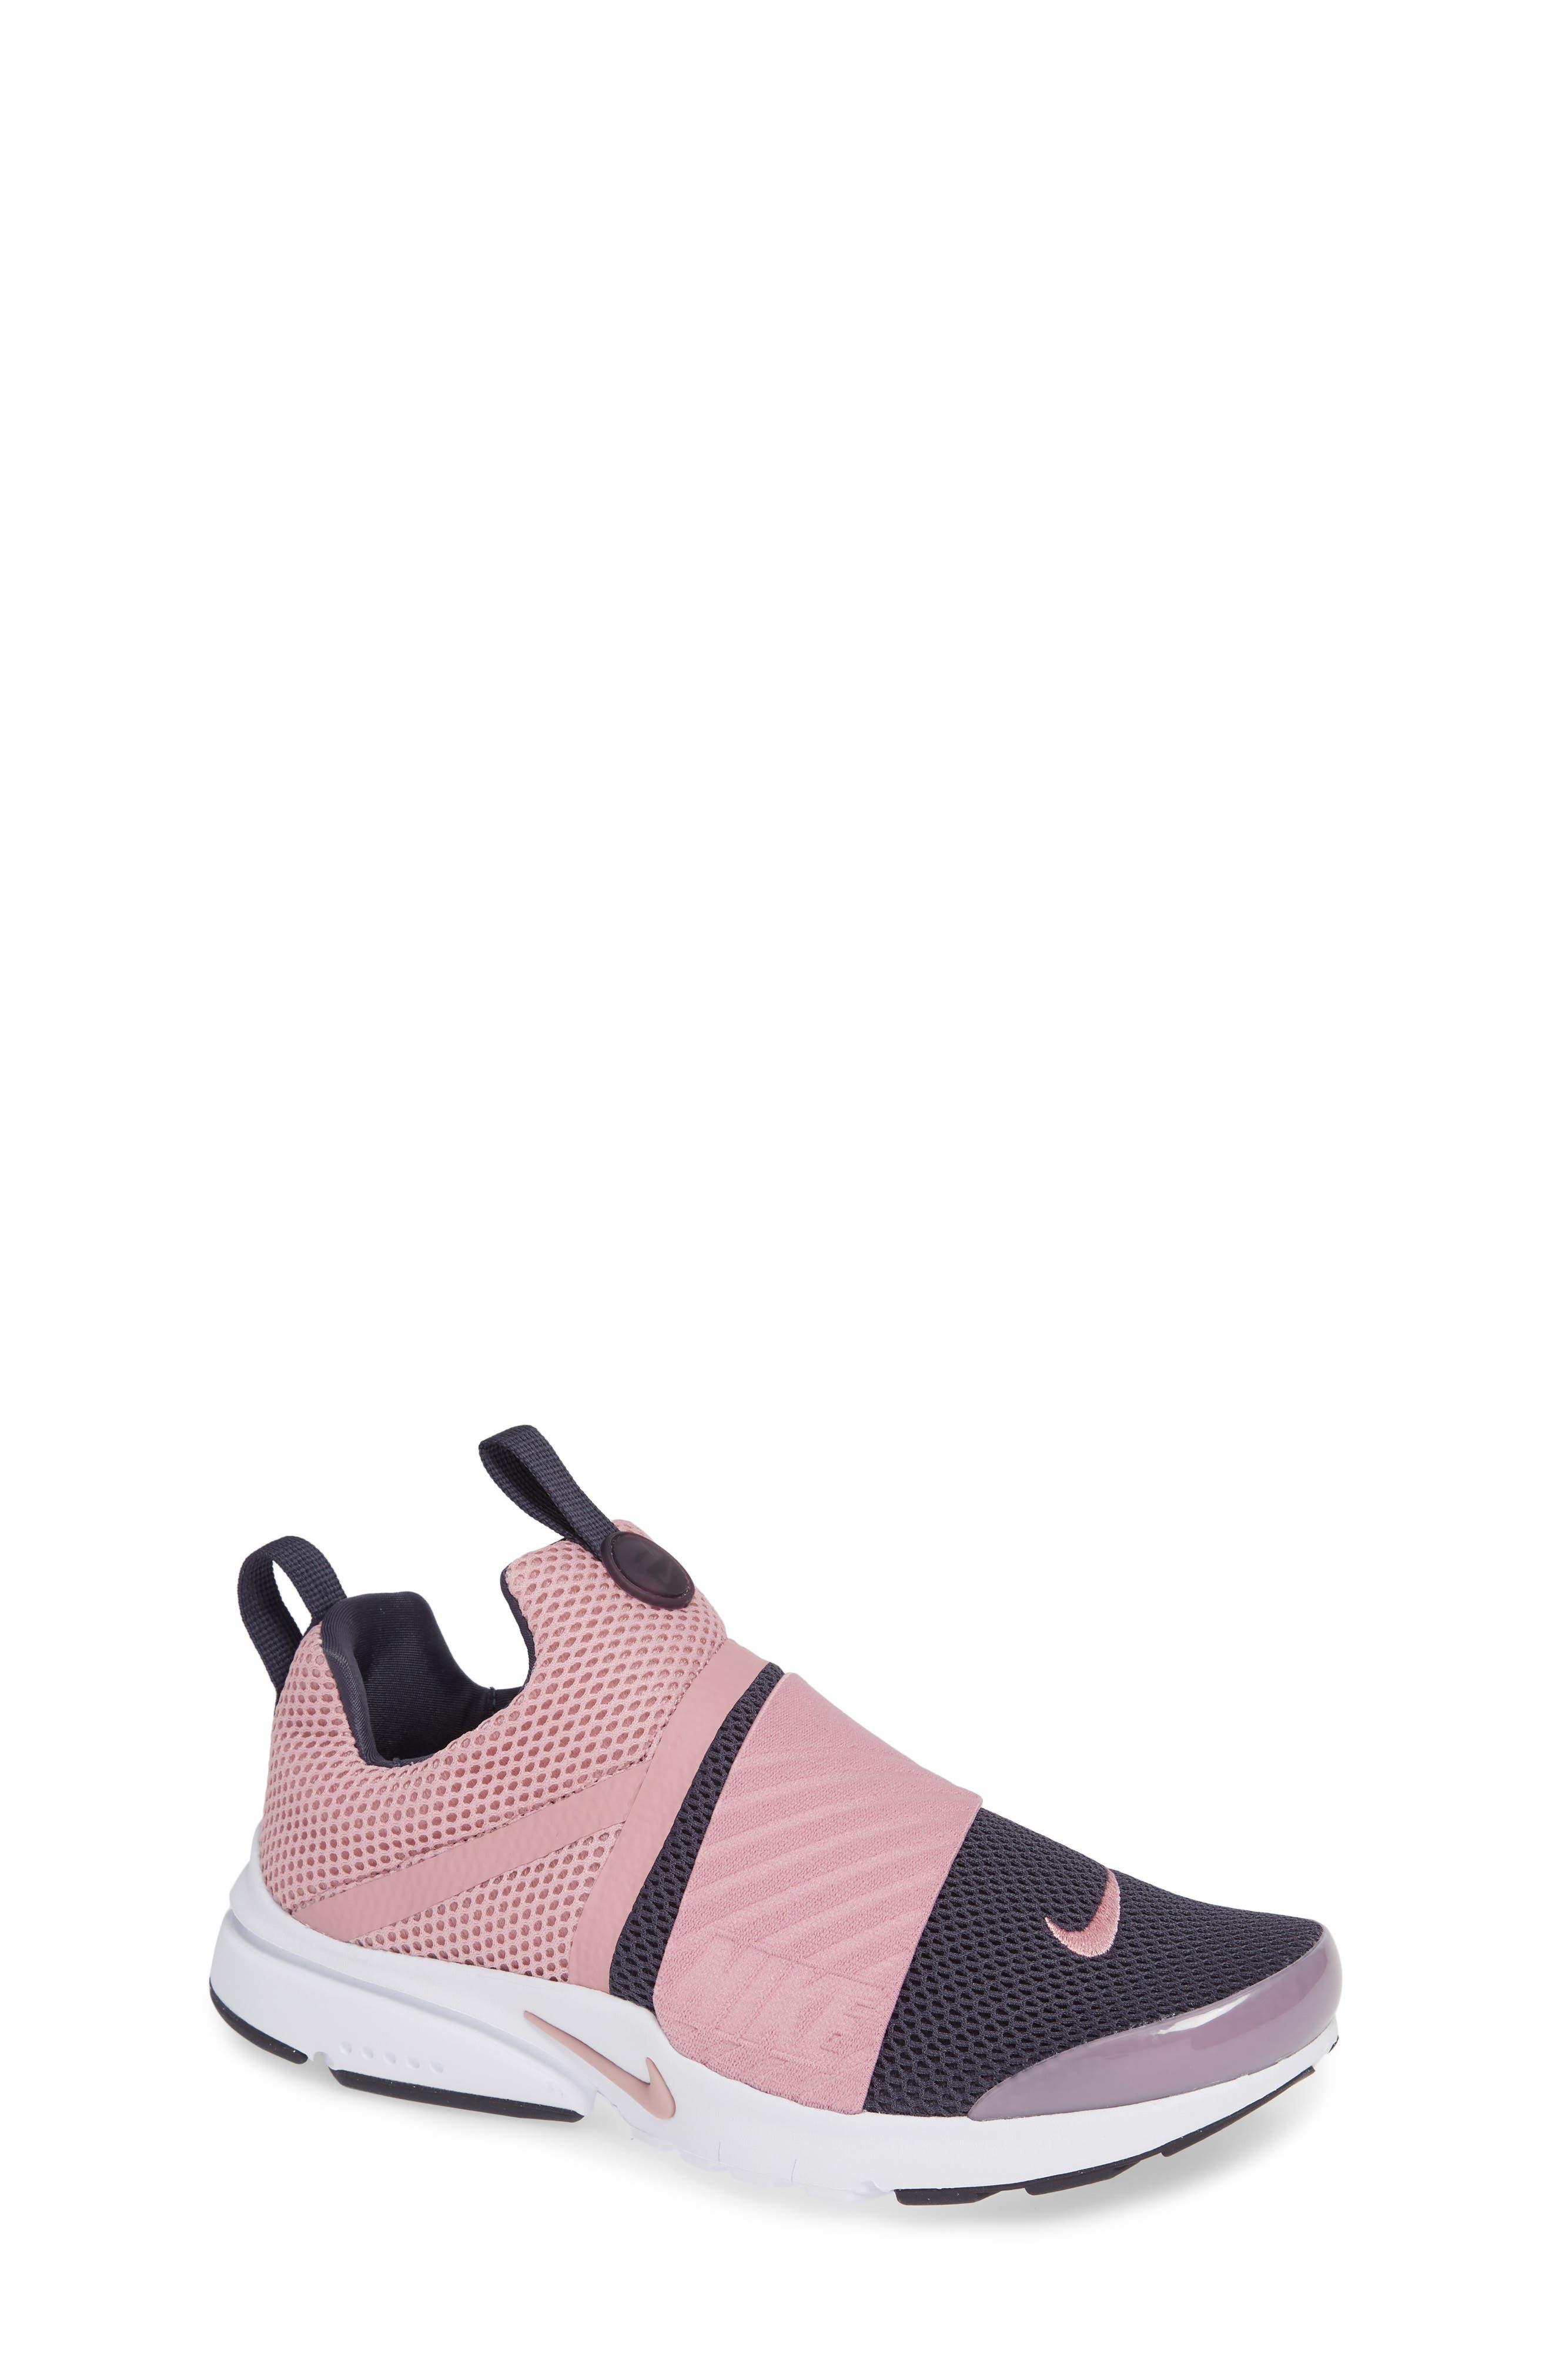 Presto Extreme Sneaker,                         Main,                         color, ELEMENTAL PINK/ GRIDIRON